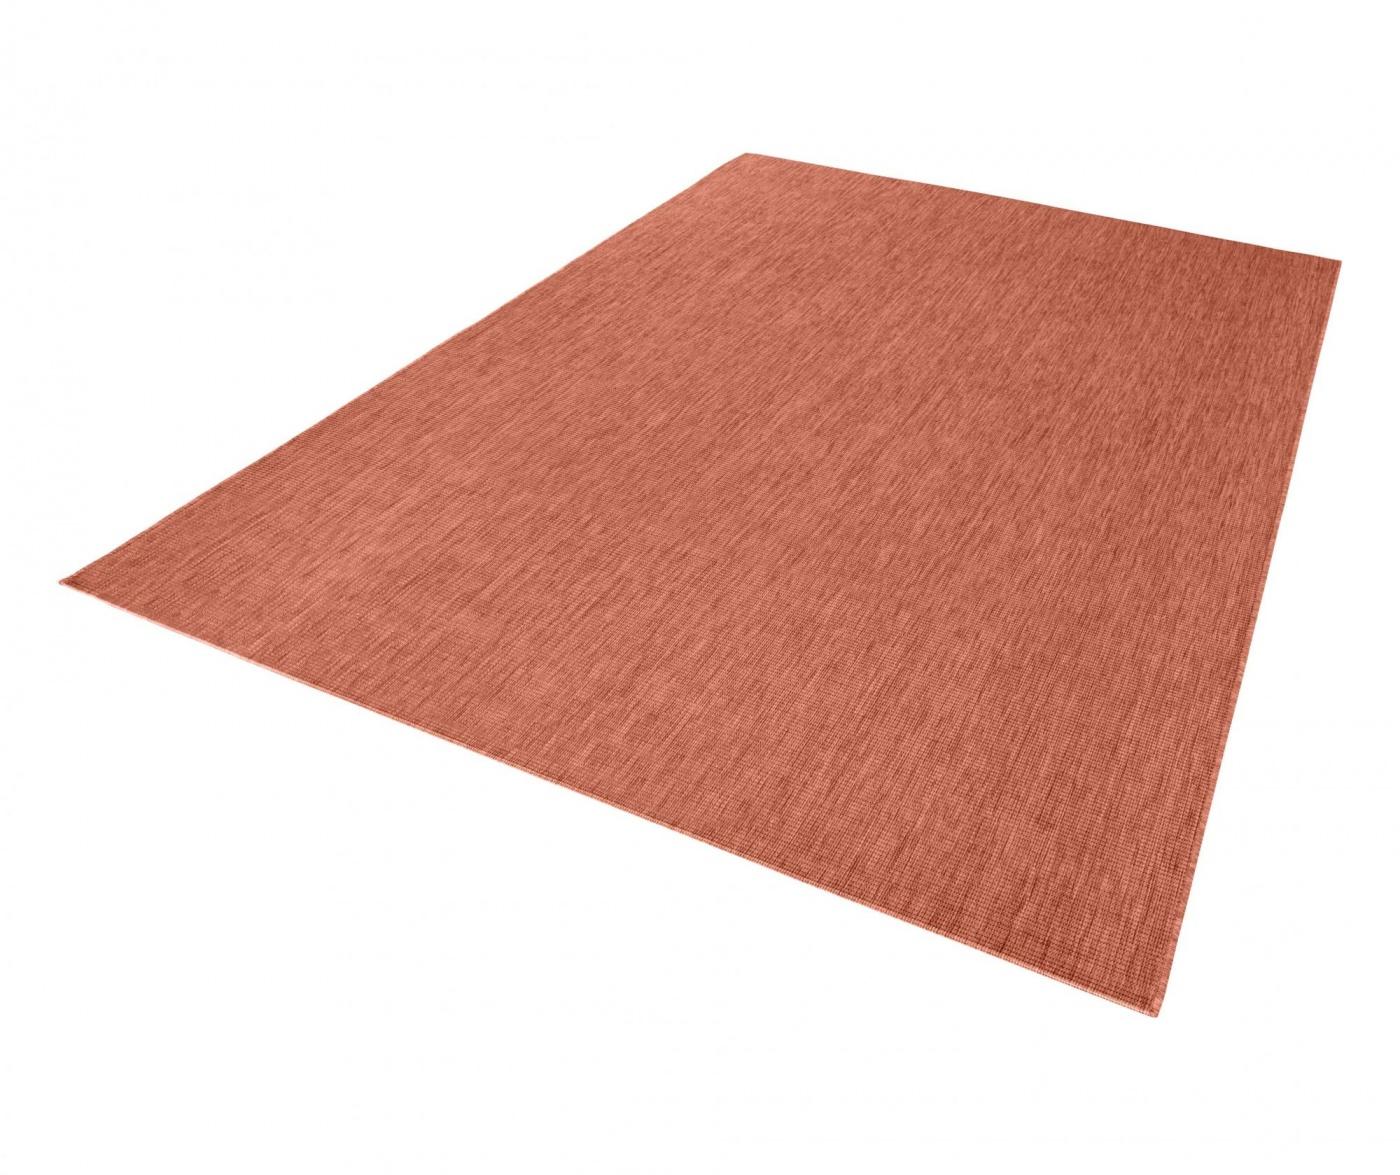 Covor de exterior Meadow Match Terracotta 80x150 cm